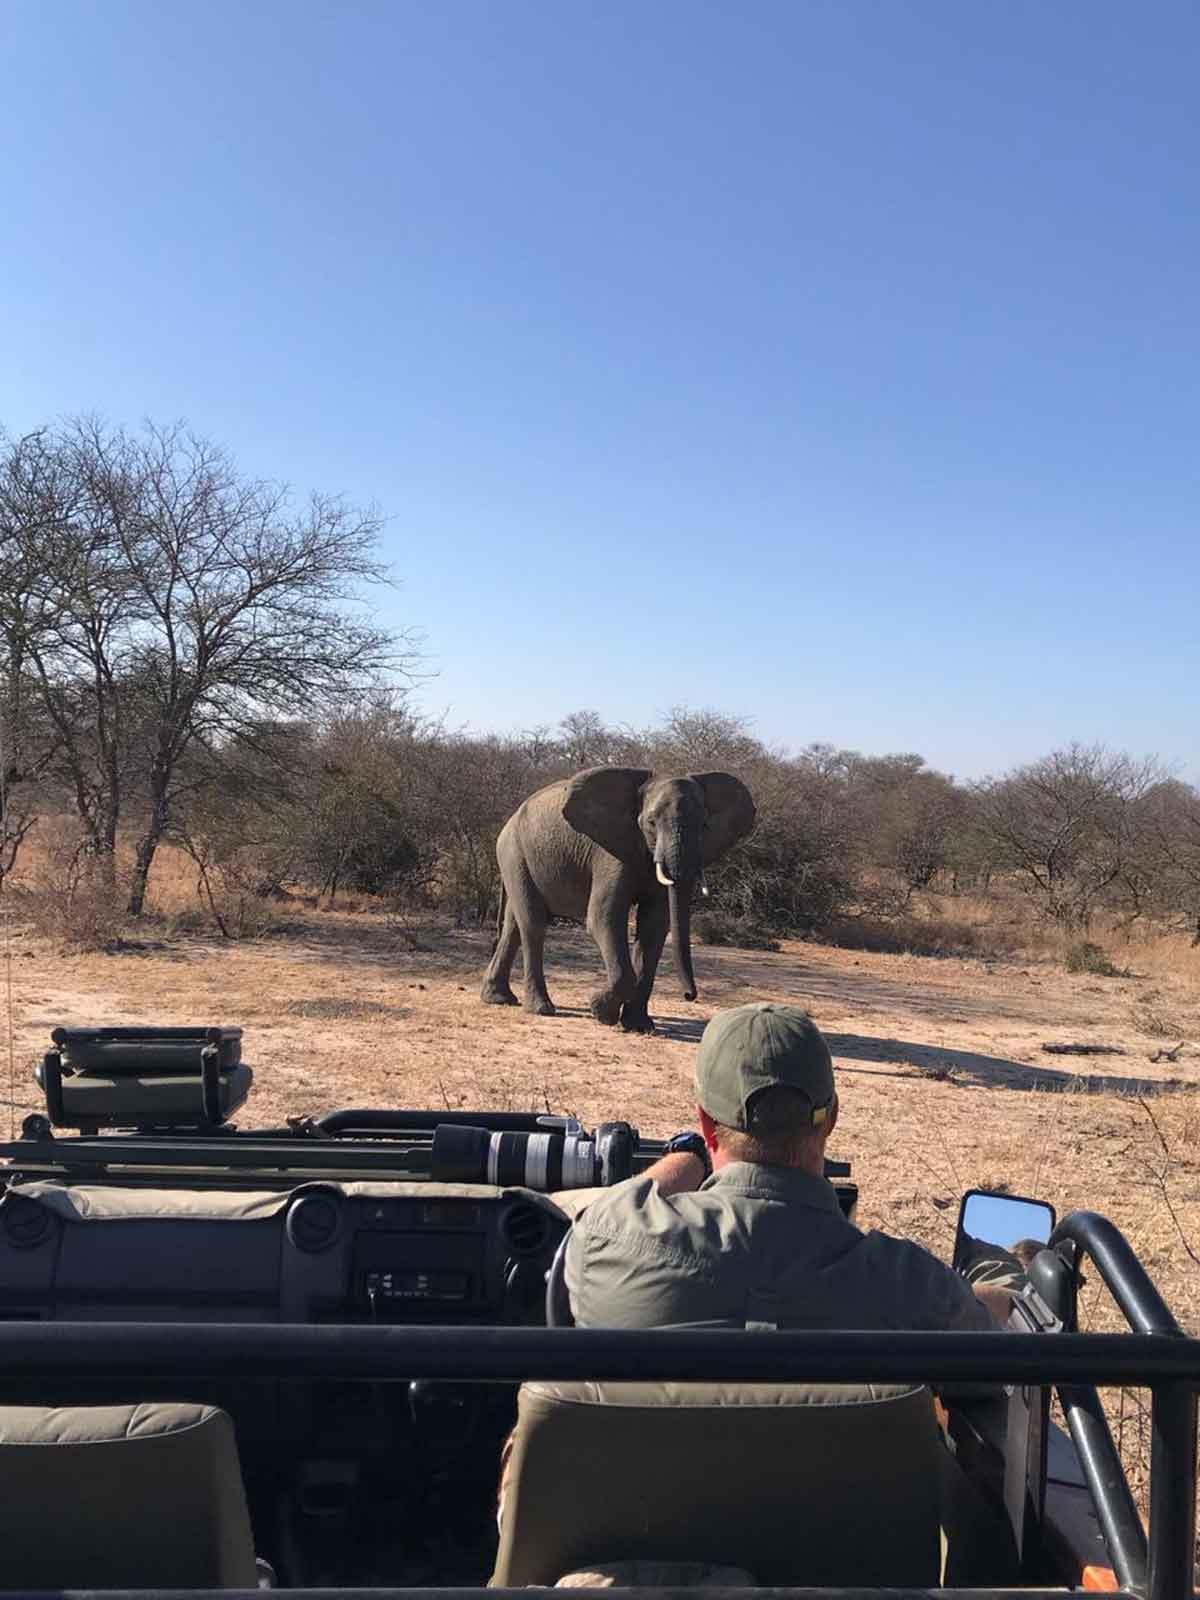 #GuestSafariReview Elephant